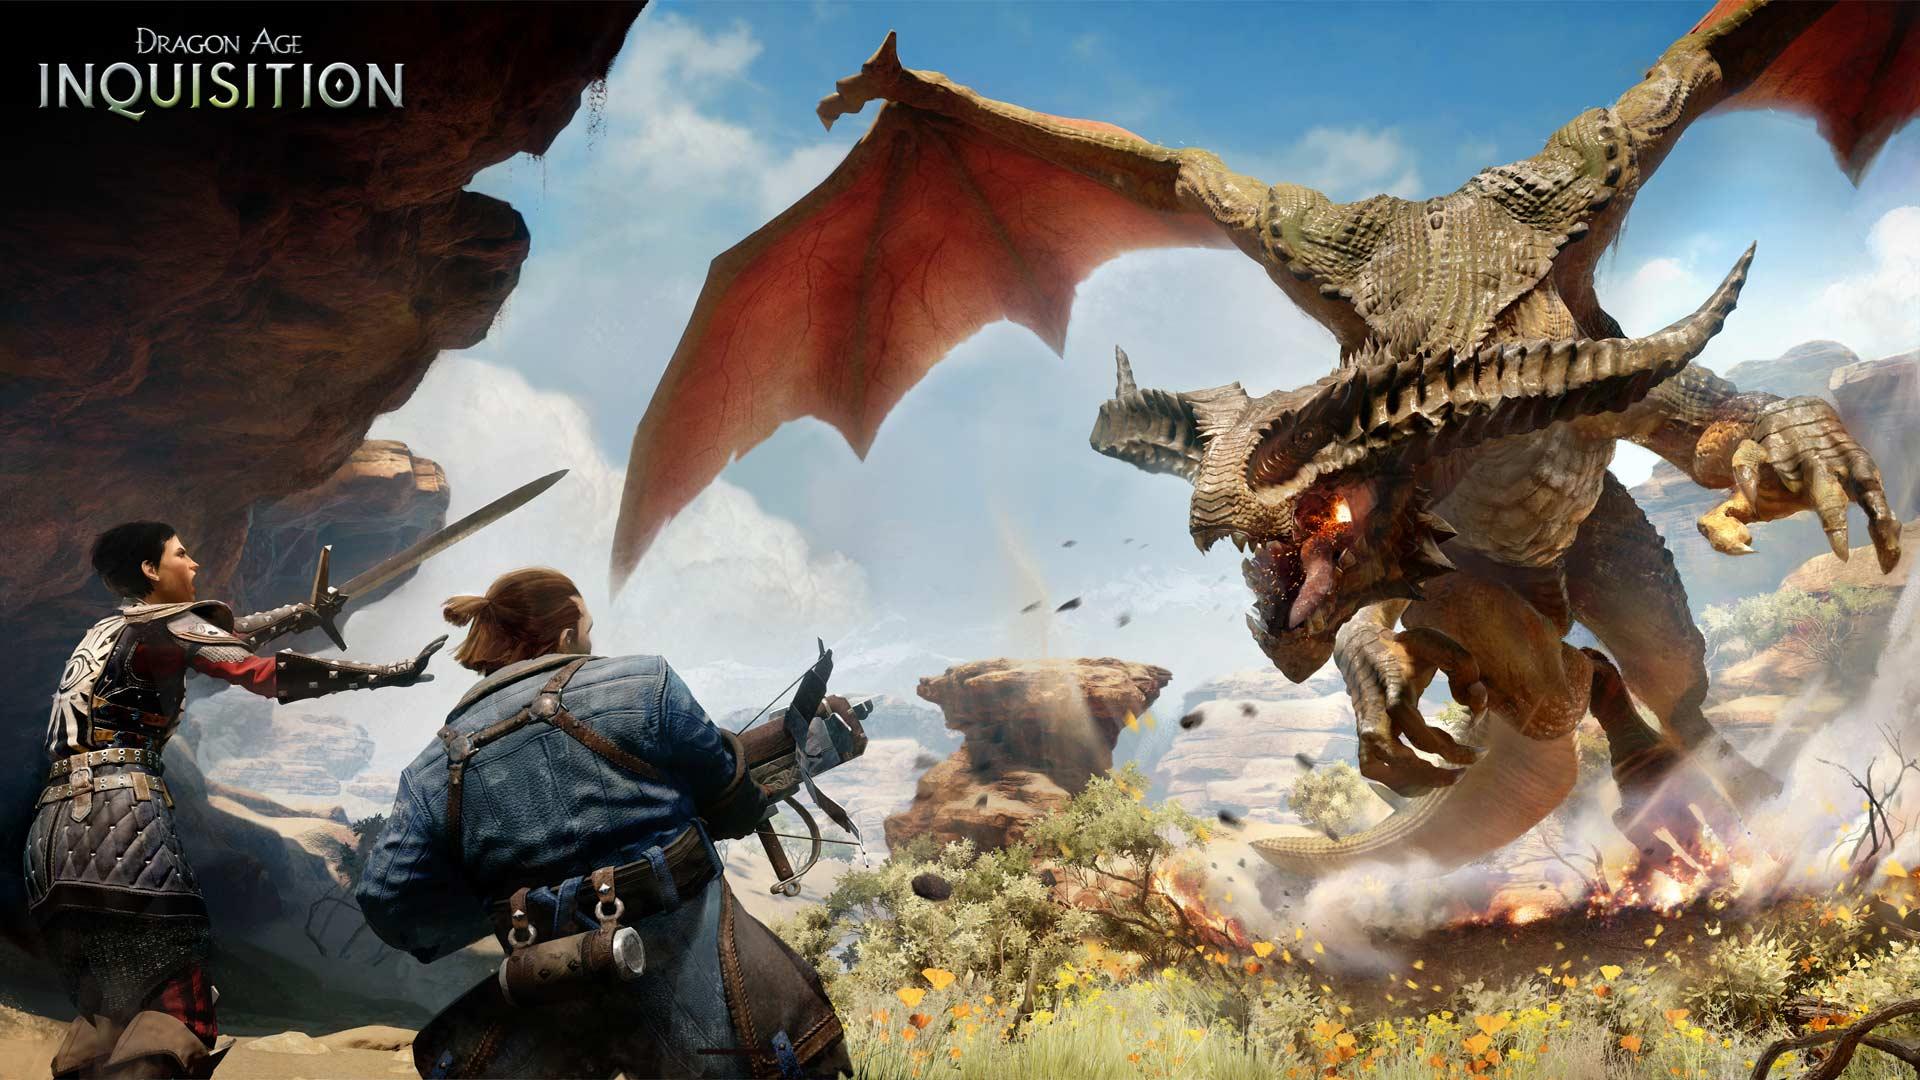 dragon-age-inquisition-goty-pc-screenshot-1